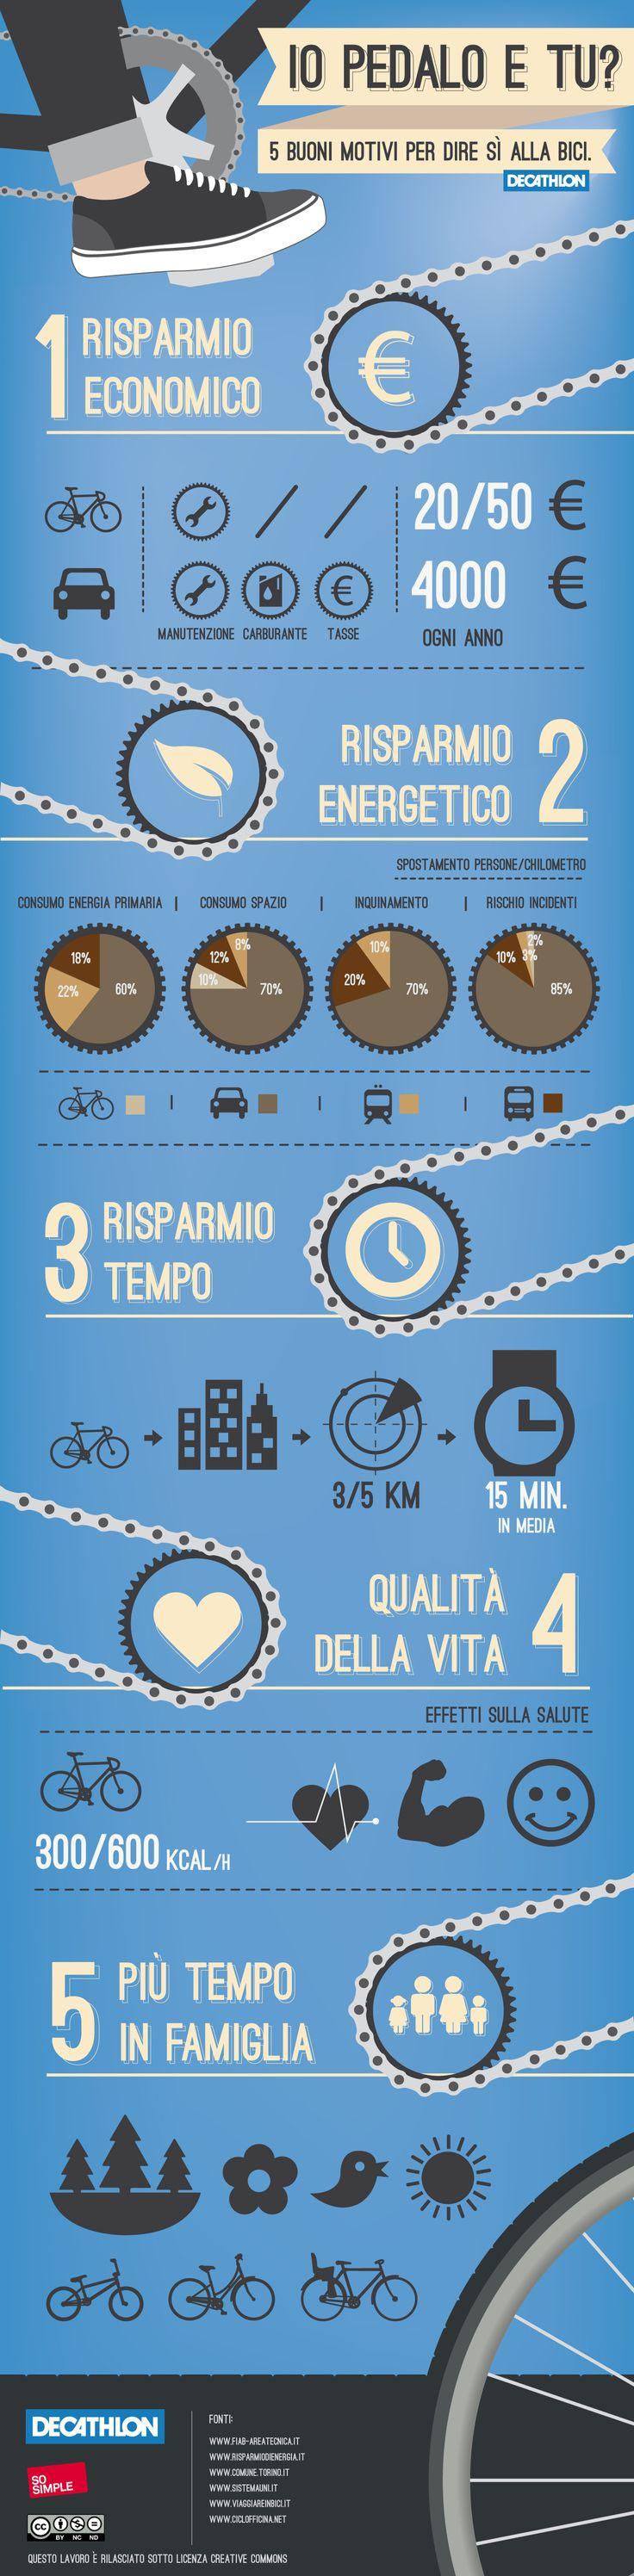 447 best 45th_2ndpj_F infographic images on Pinterest | Motion ...